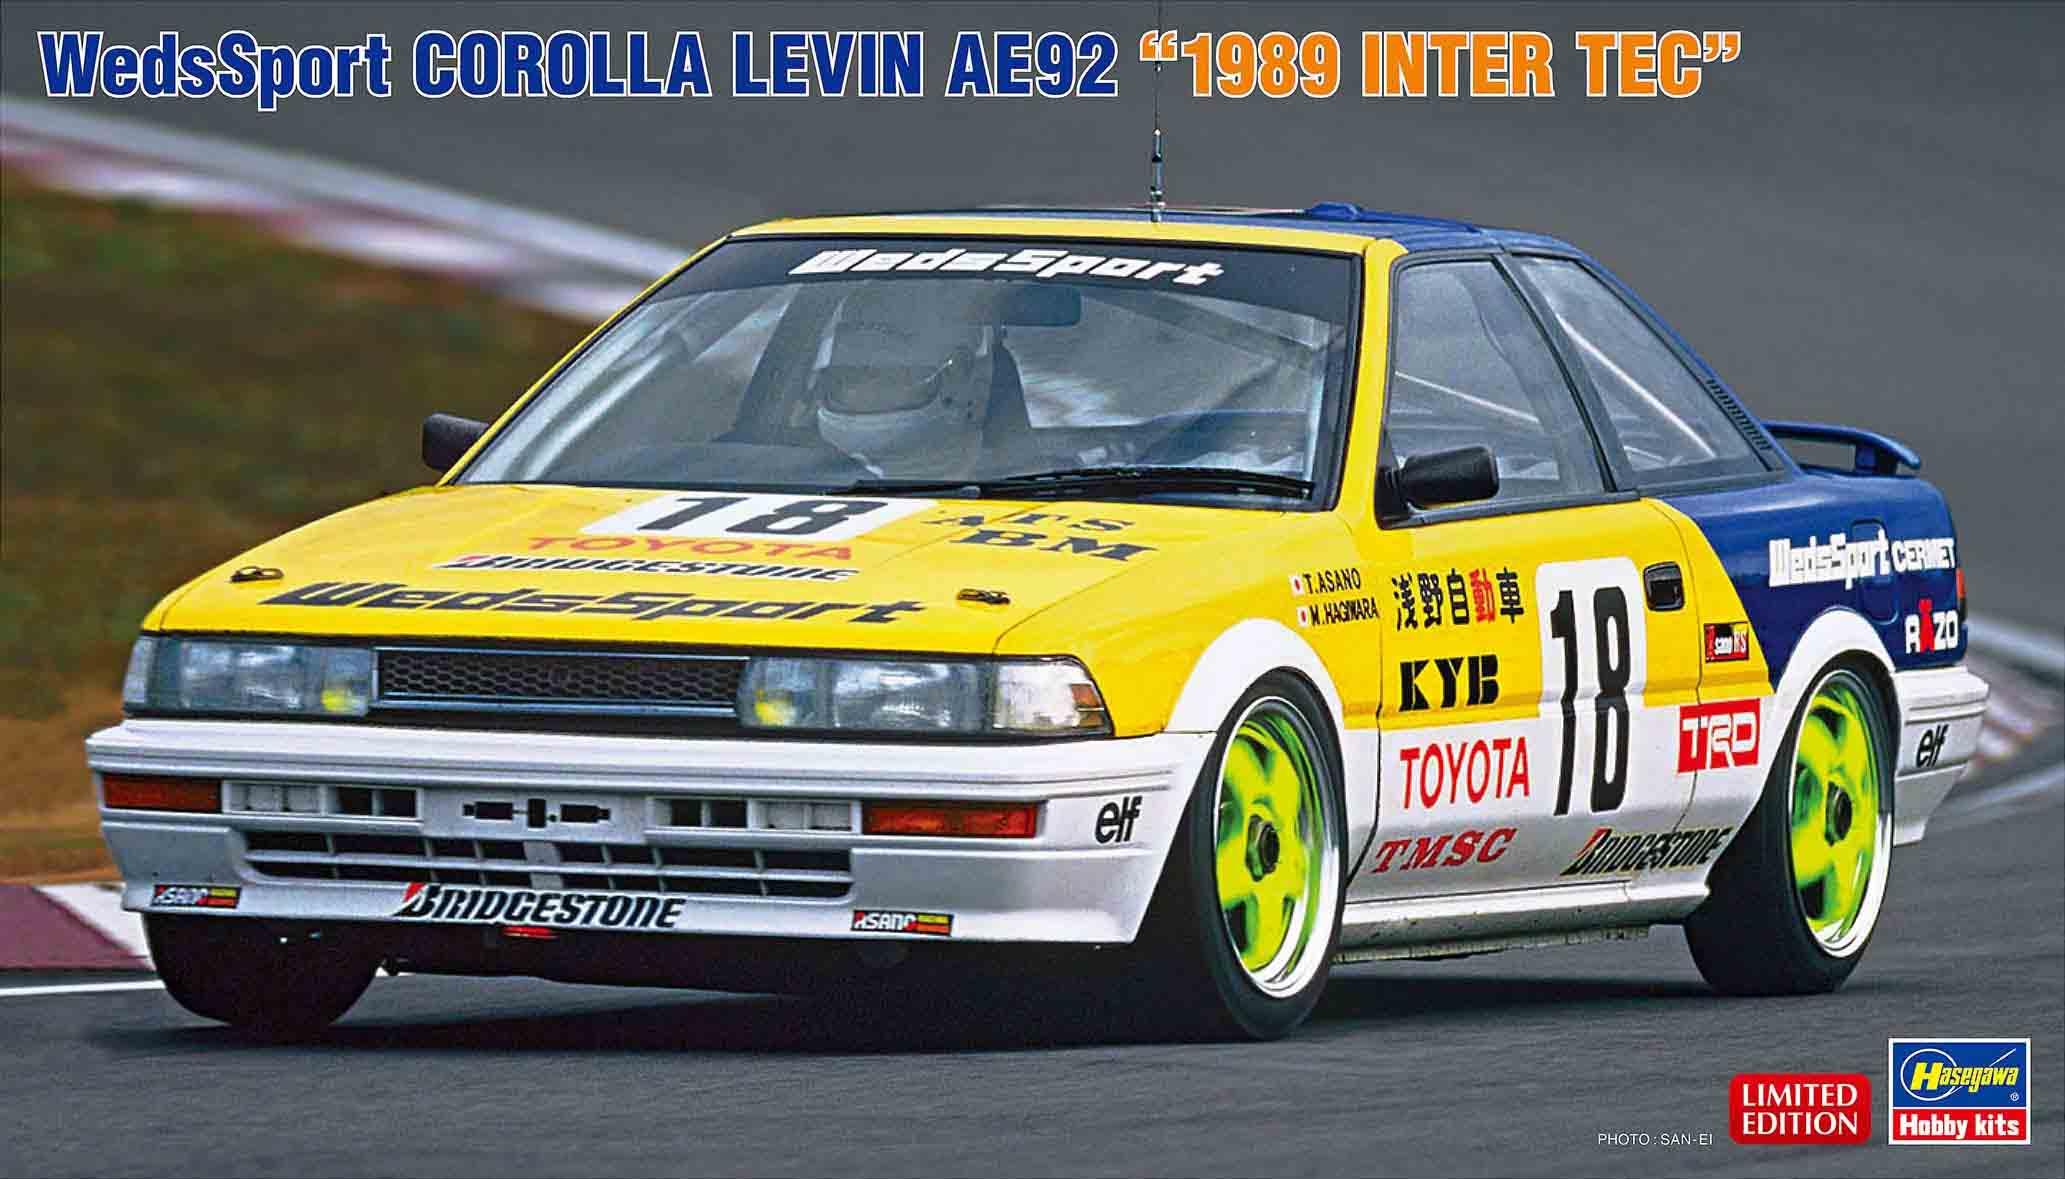 "Hasegawa 1/24 Wedssport Corolla Levin AE92 ""1989 Inter Tec"""